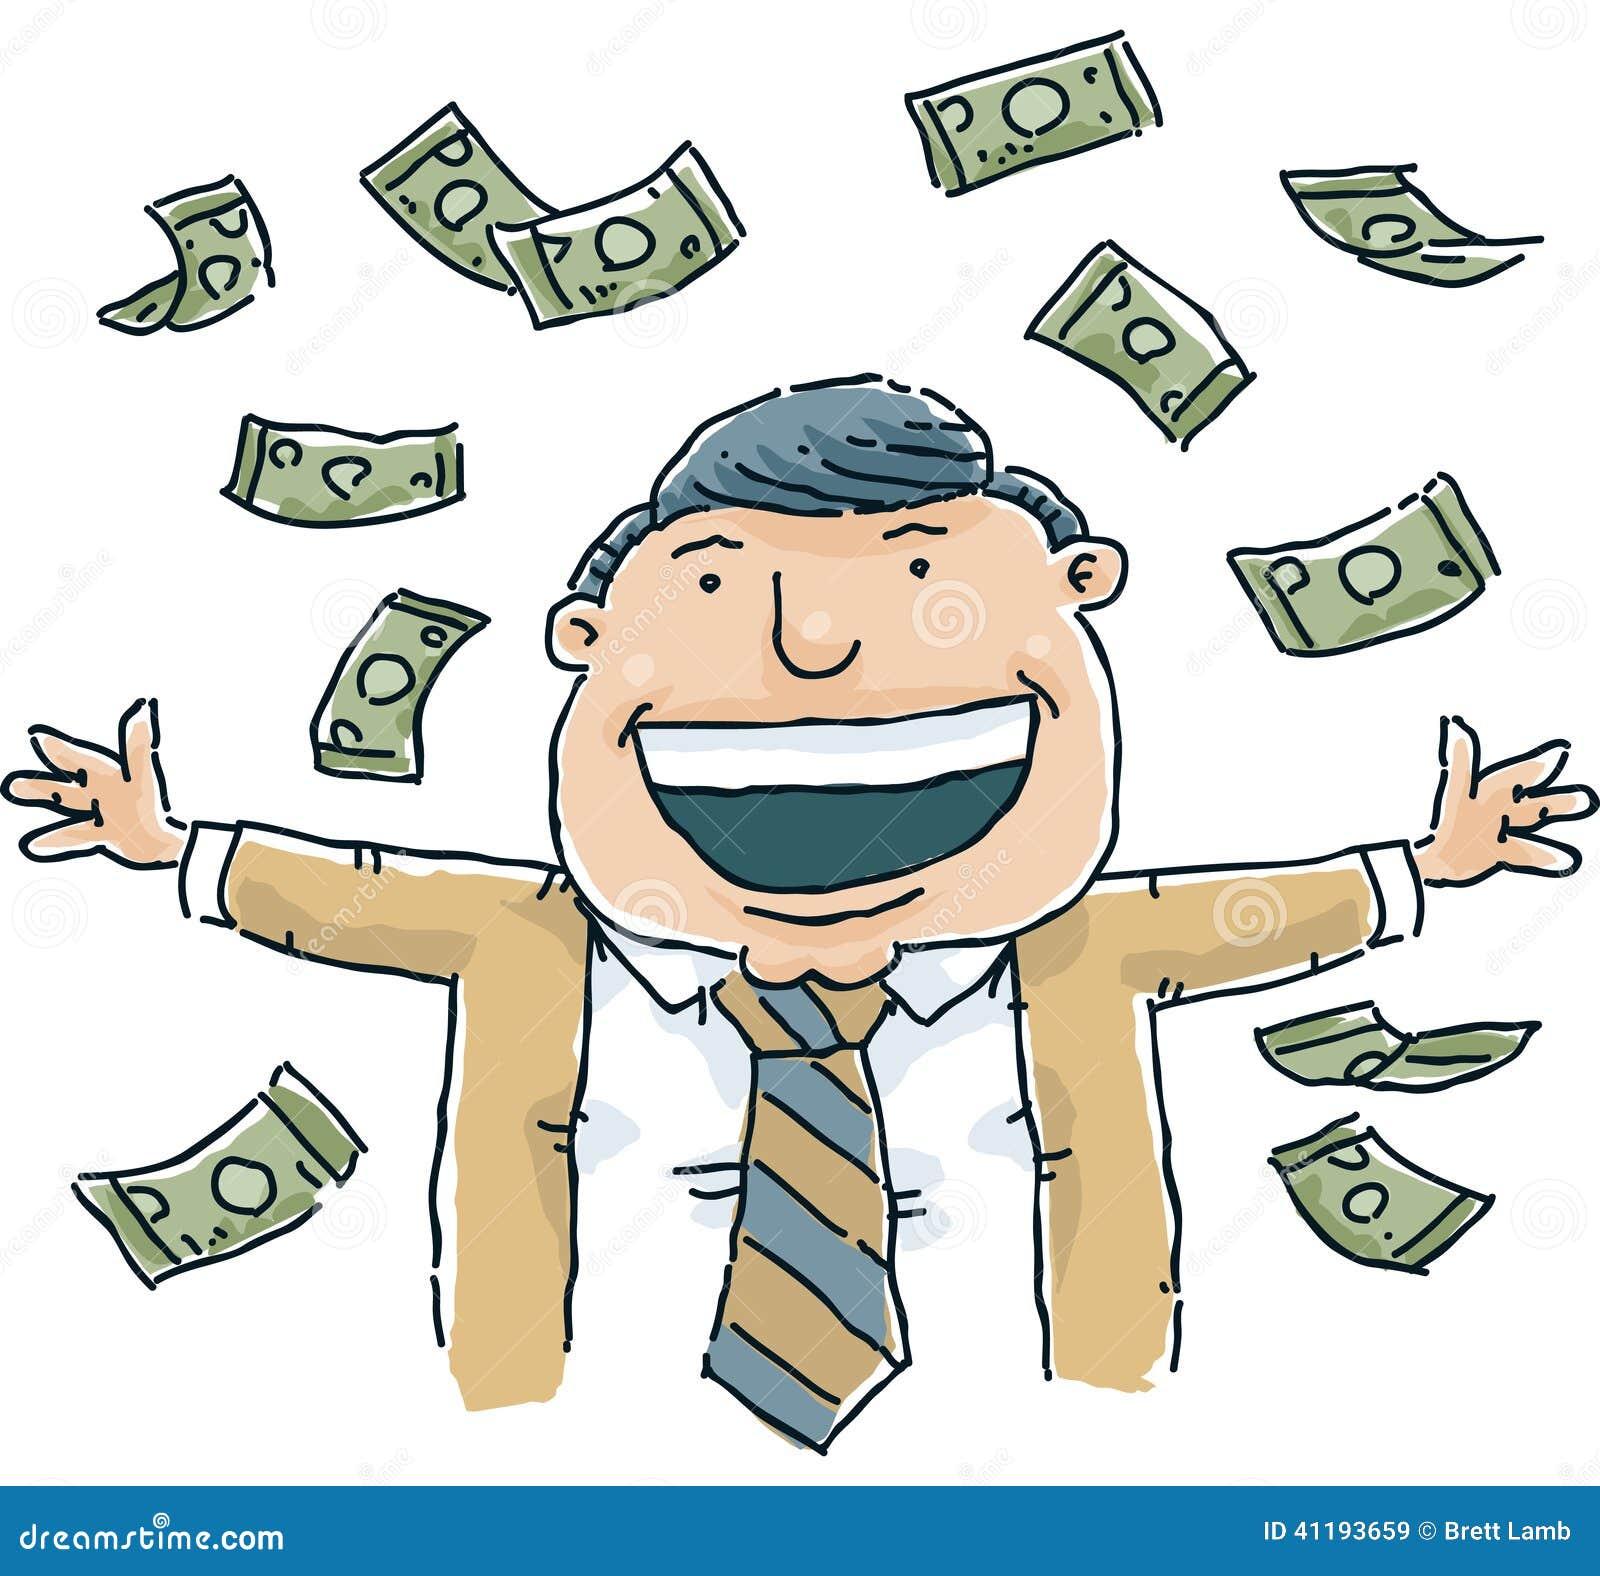 ... cartoon man celebrates as it rains cash money. mr: no; pr: no